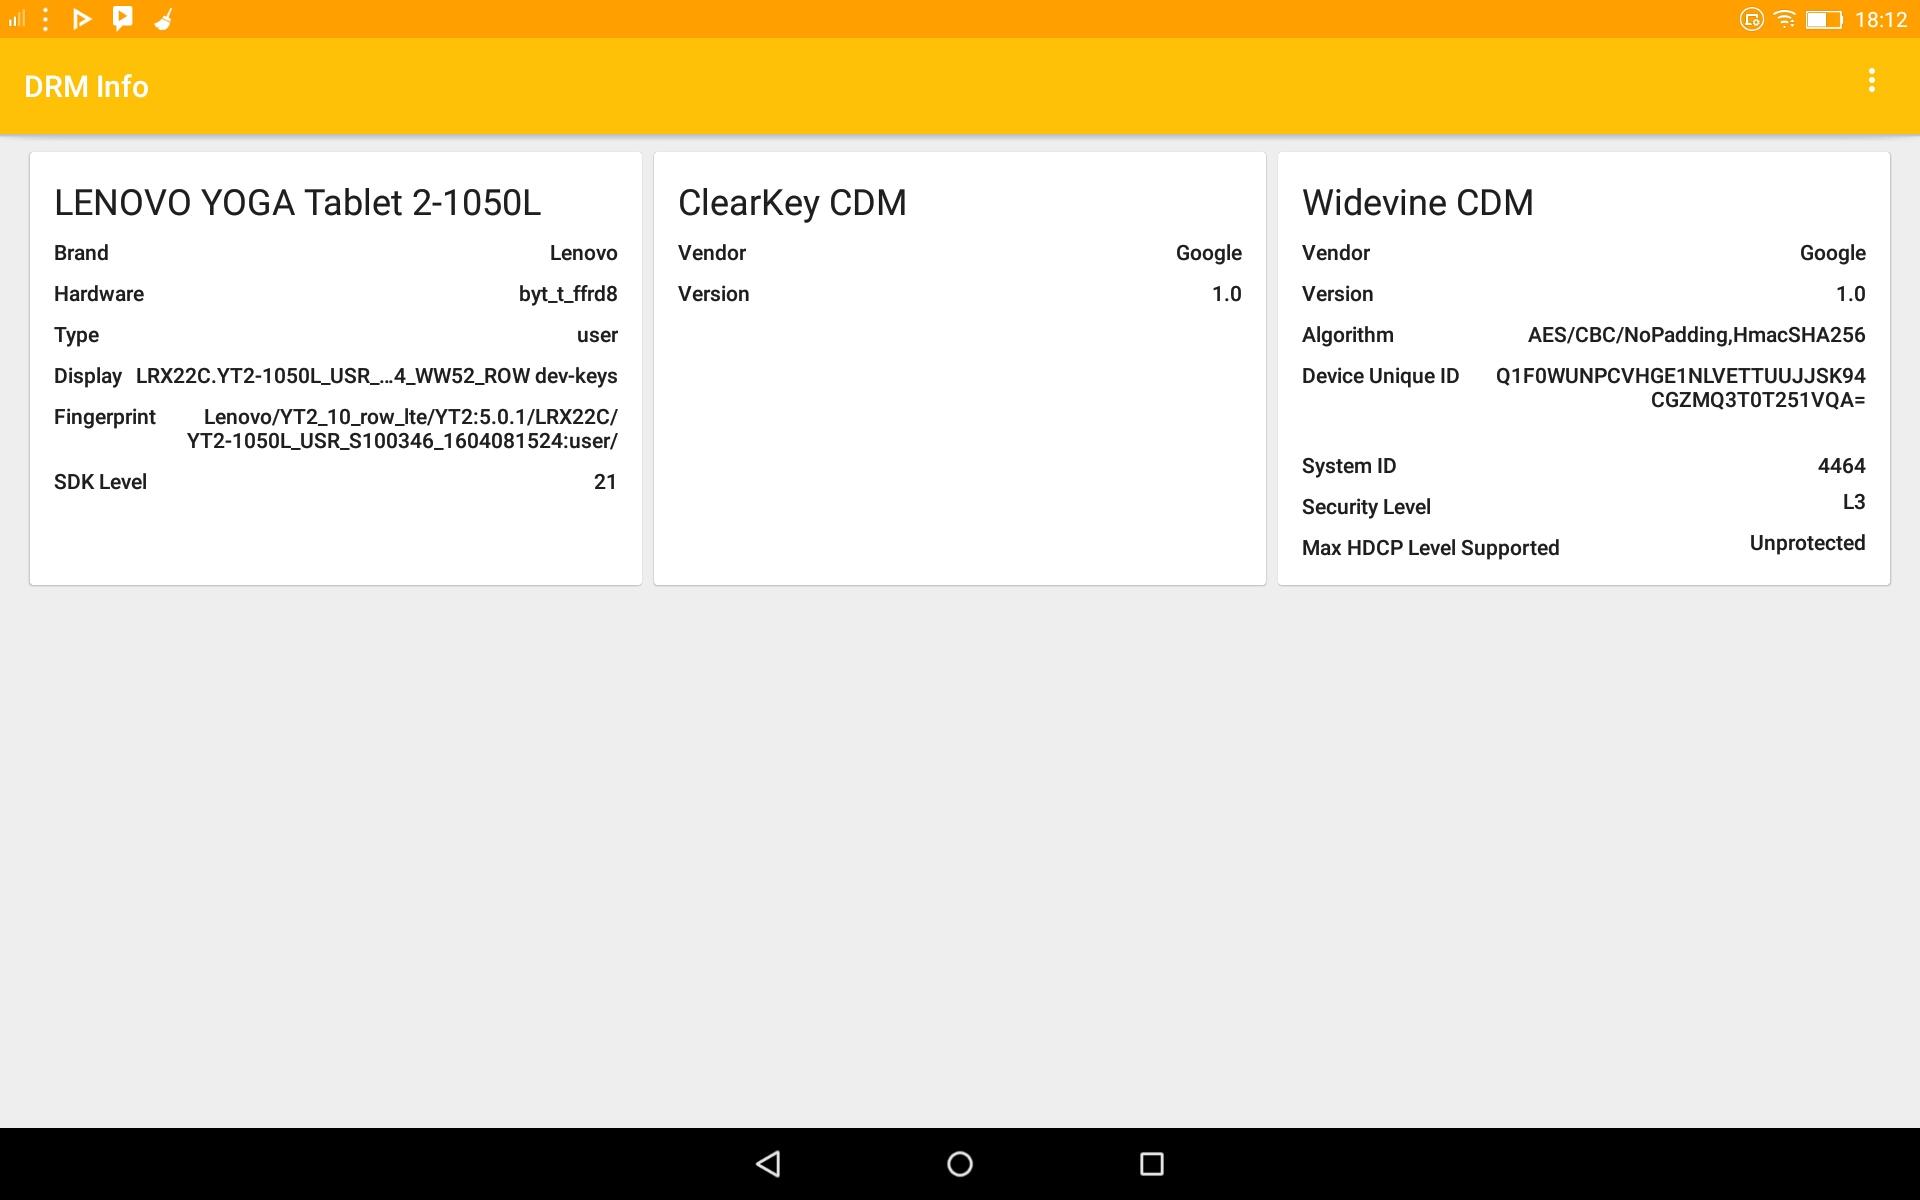 Google Widevine Modular DRM - Mi Pad 4 Plus | Xiaomi European Community